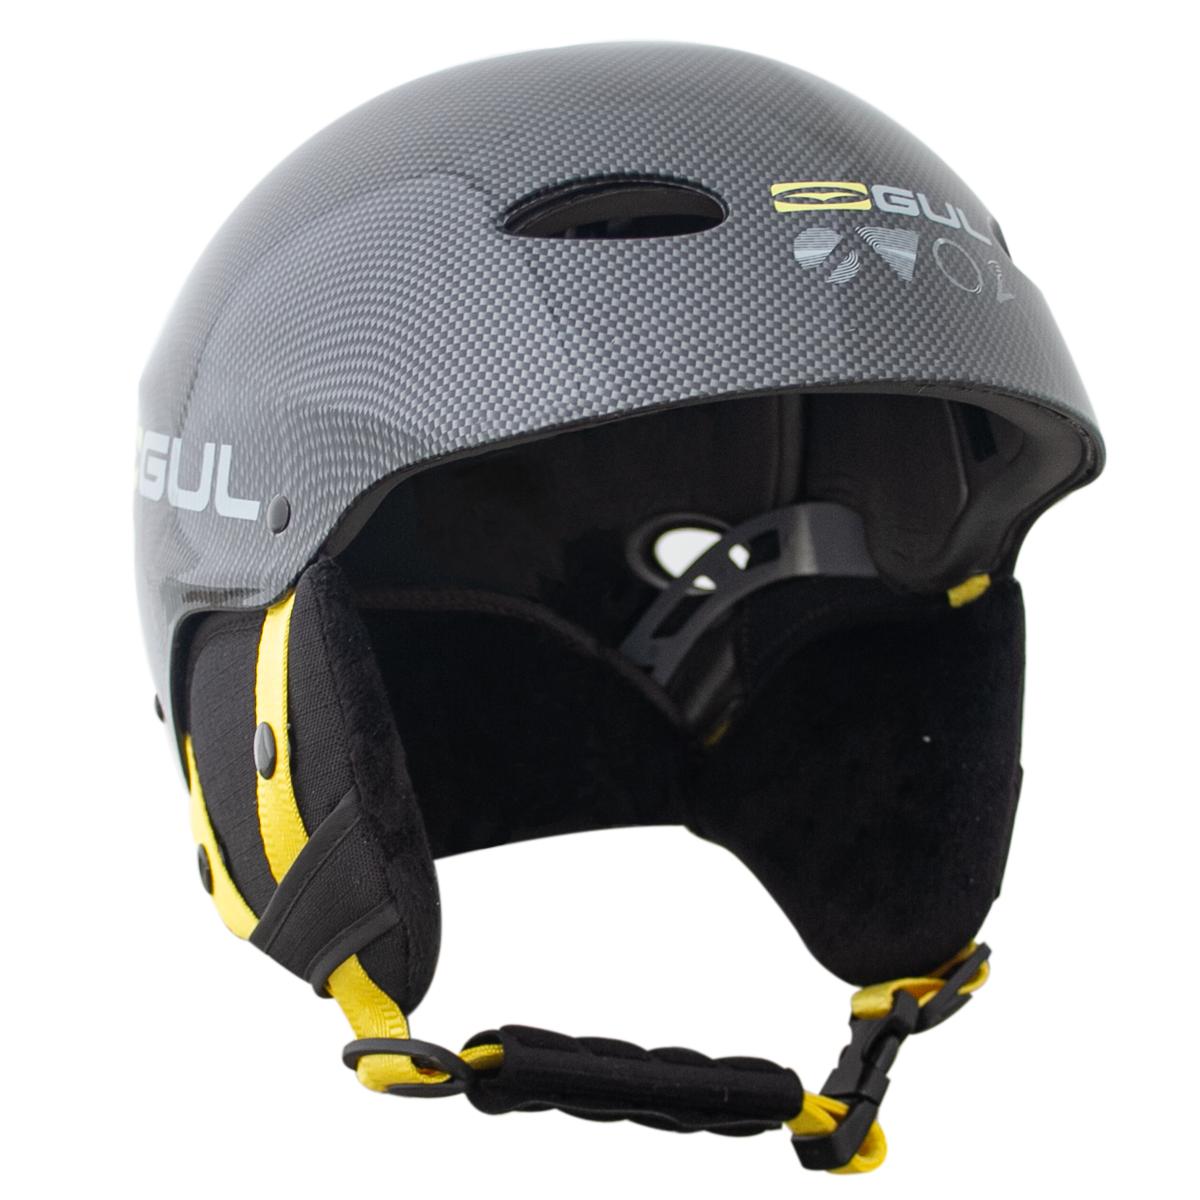 Helma 19' GUL Evo 2 Helmet AC0103 black - JNR